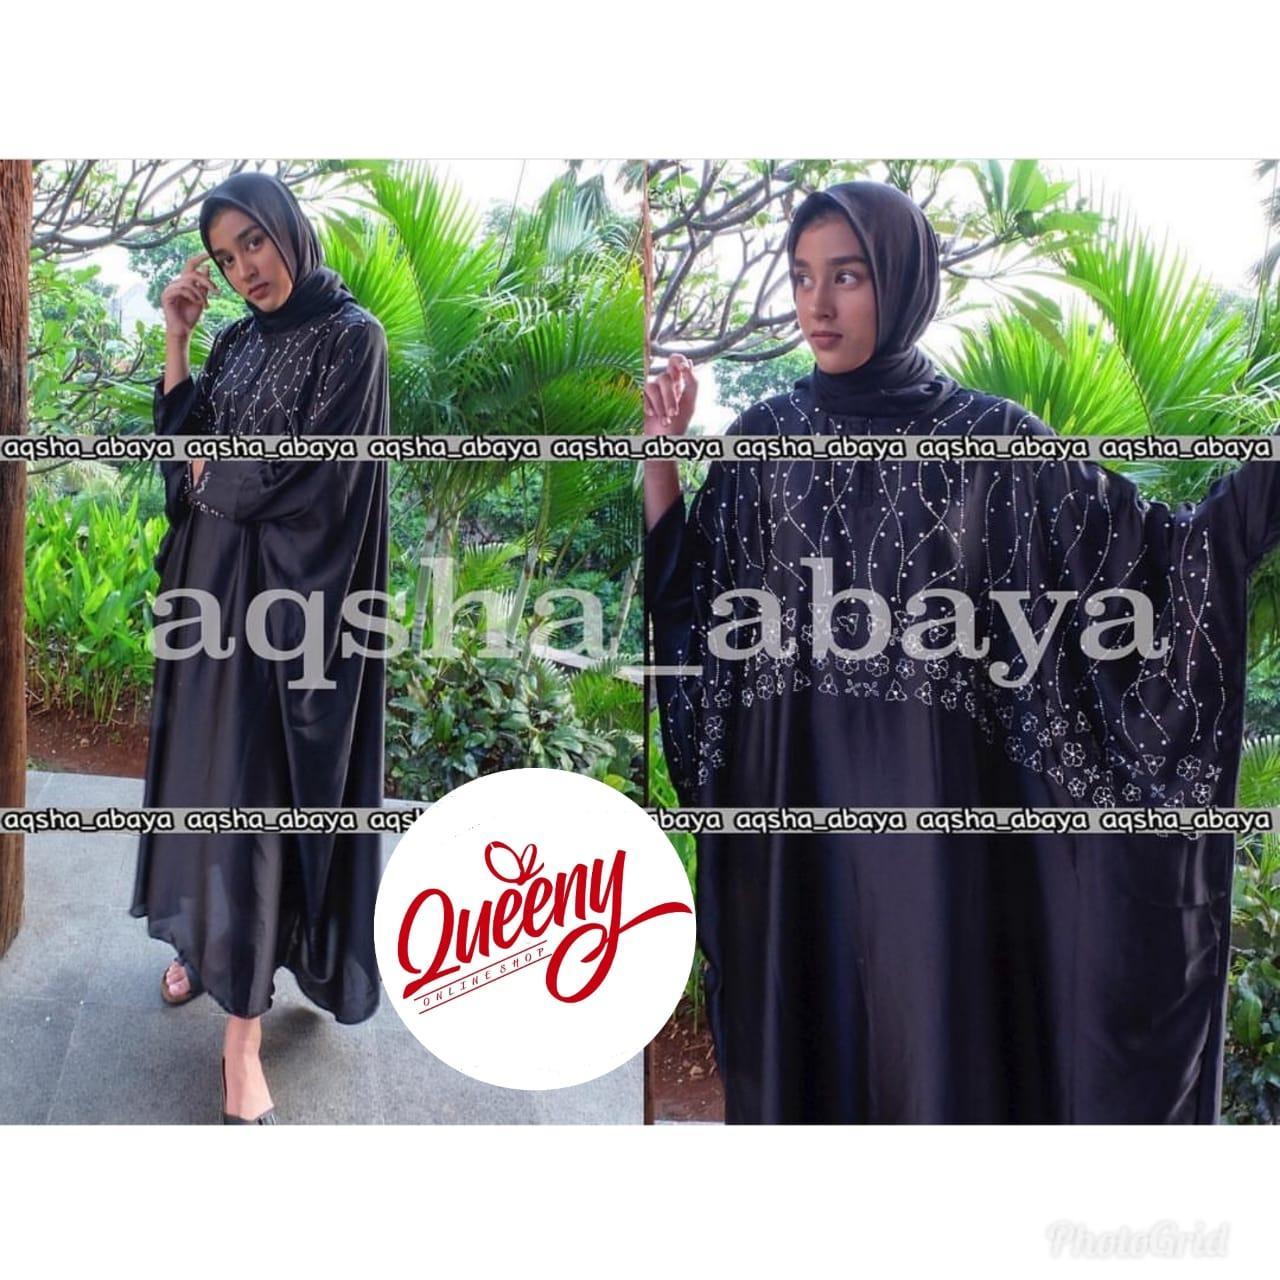 gamis abaya muslimah / kaftan arab islami / abaya satin marbella fashion muslim kombinasi payet mewah